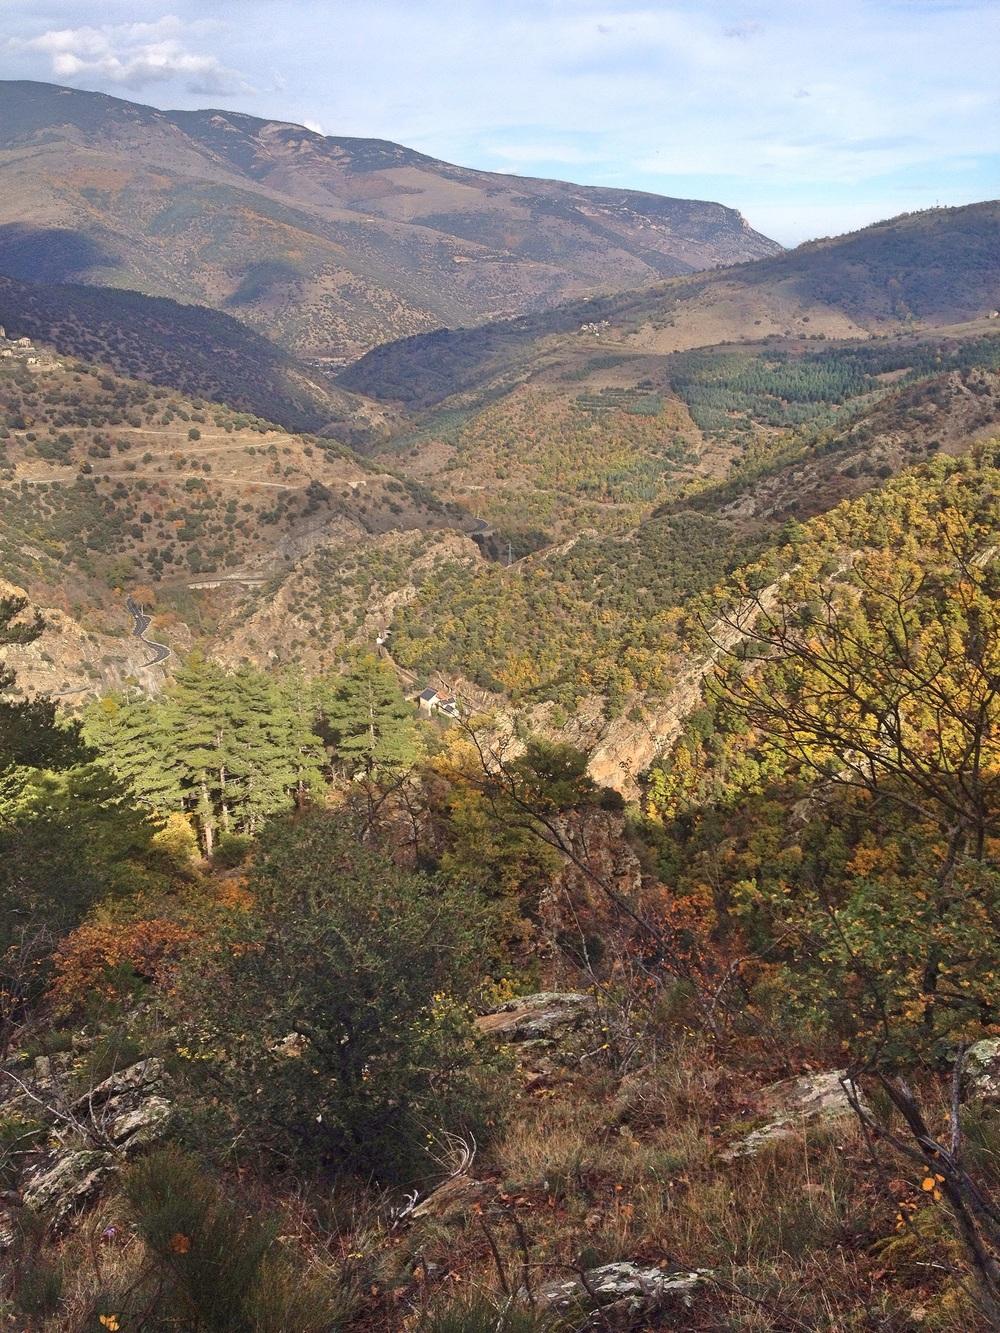 Views on the walk/hike